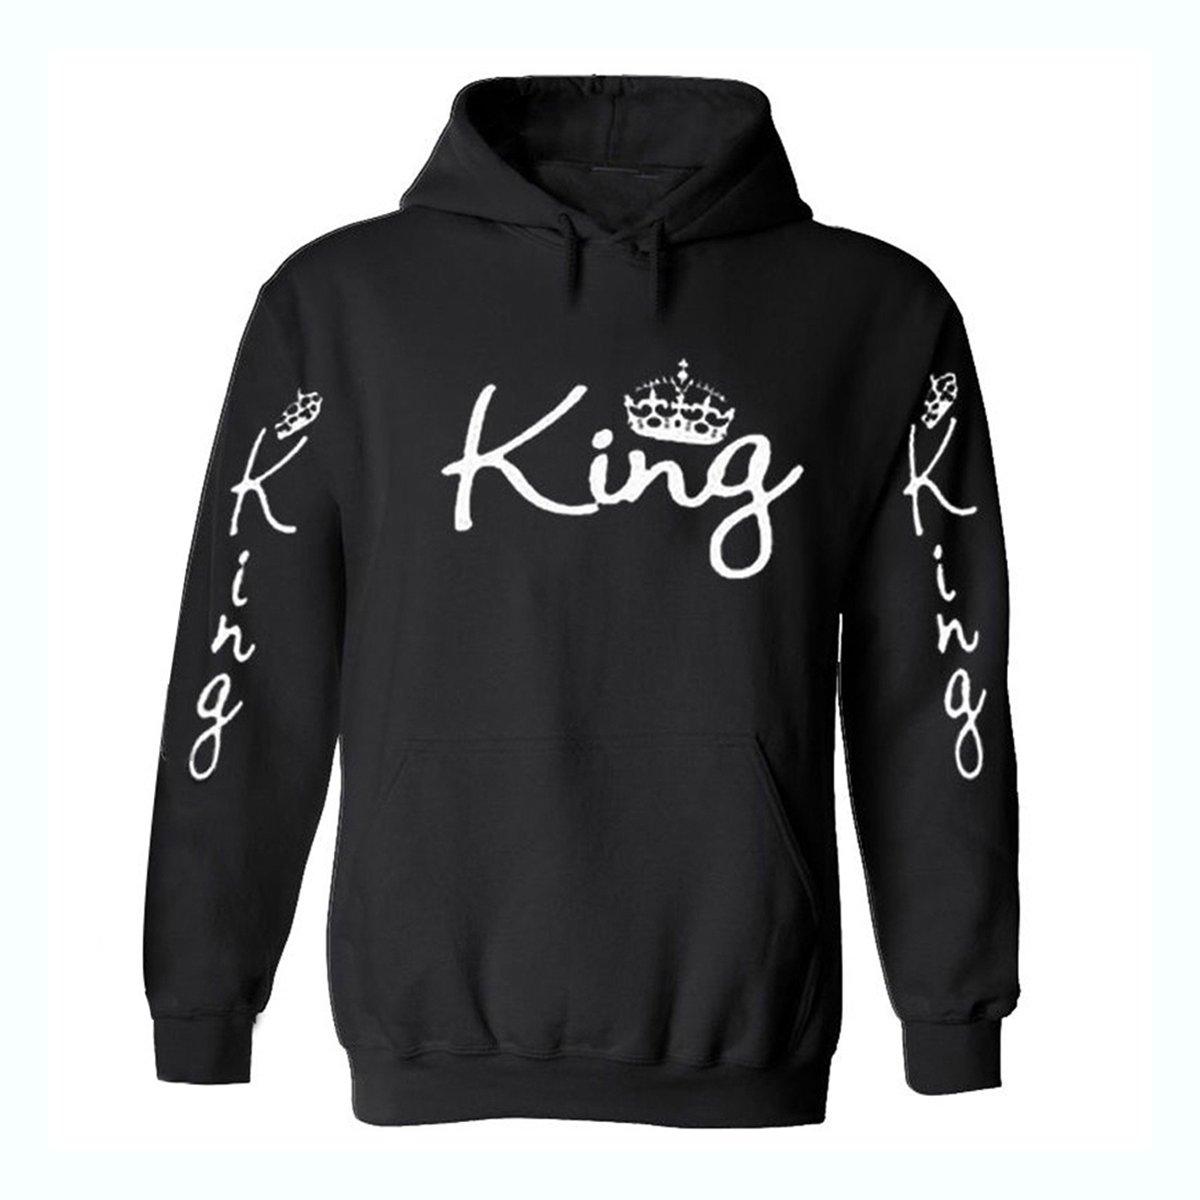 testMen Women Hoodies Sweatshirts Casual Long Sleeve King Printing Hooded Sweater Loose Tops Shirt for Autumn Winter Size M